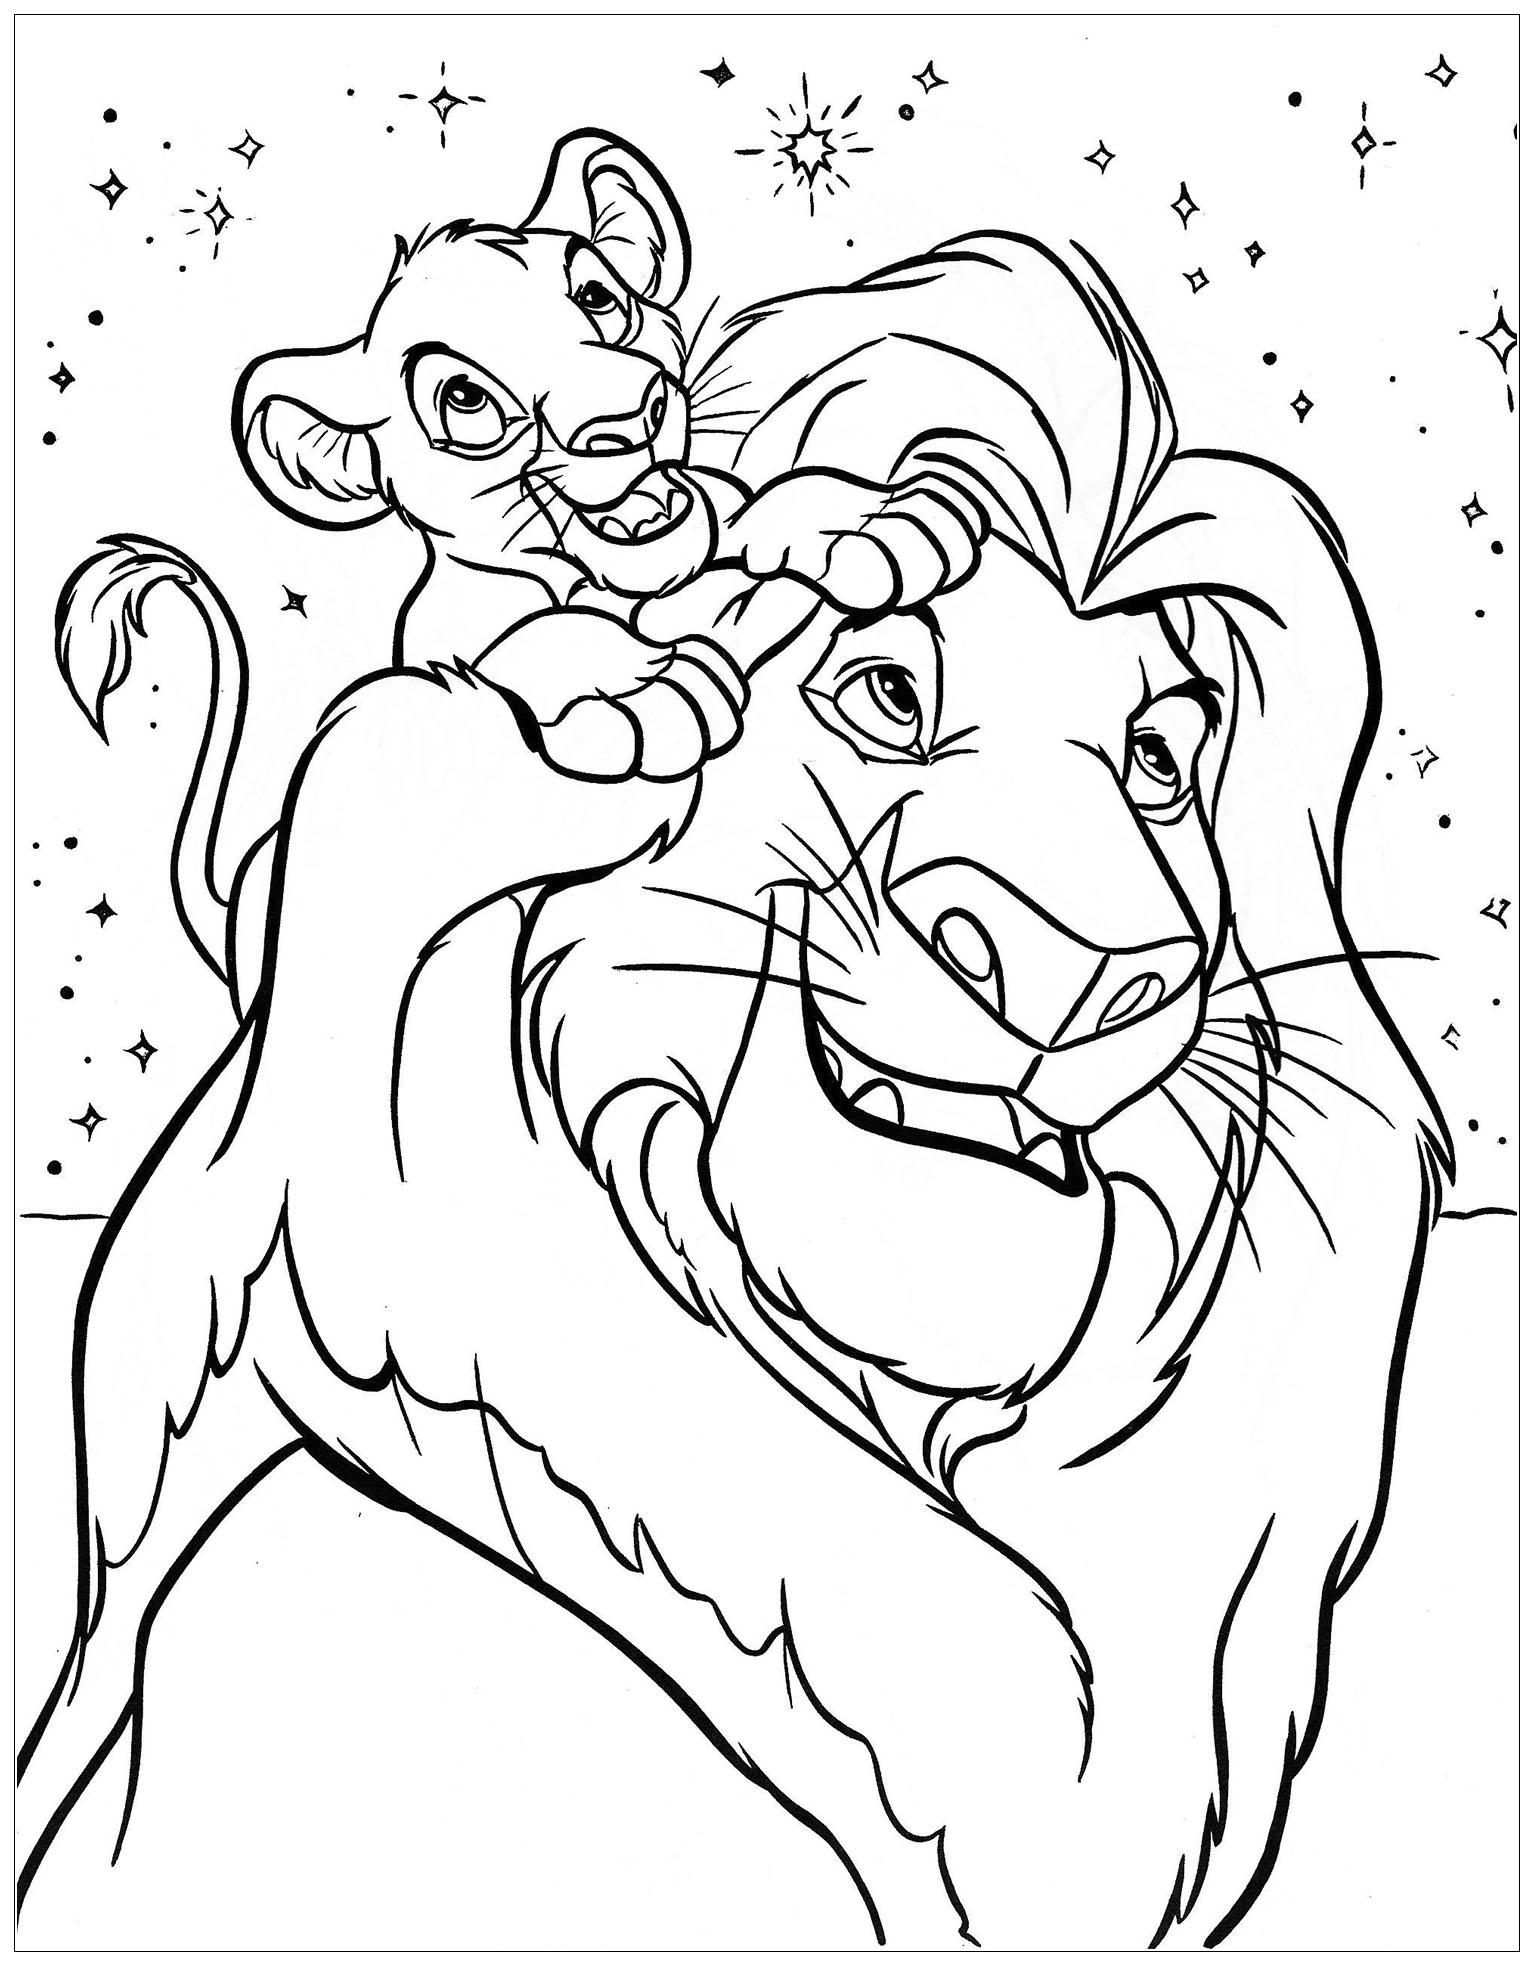 Mufasa With His Son Simba